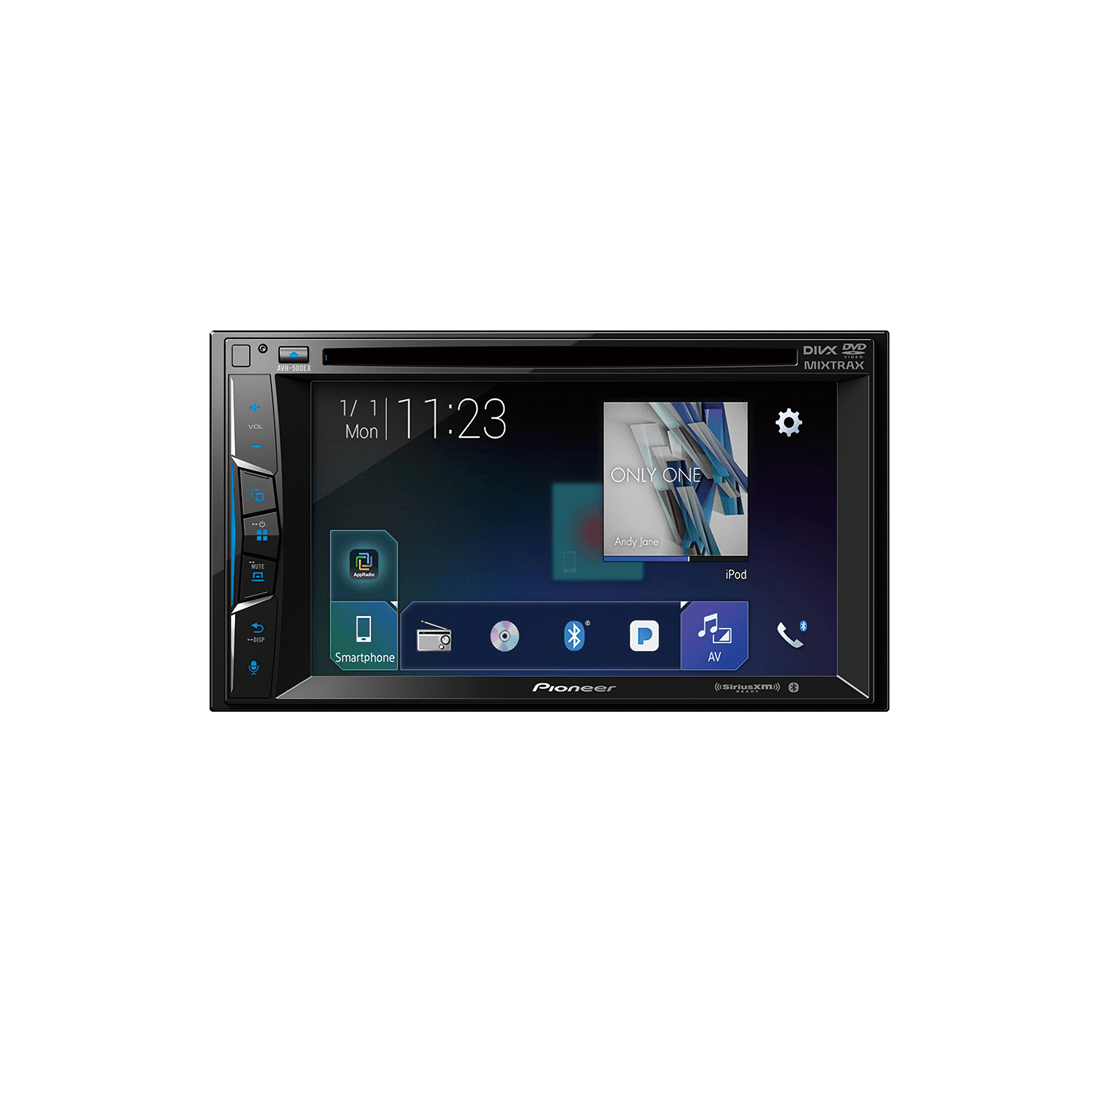 Pioneer Avh 500ex 6 2 Multimedia Dvd Receiver # Meuble Tv Double Face